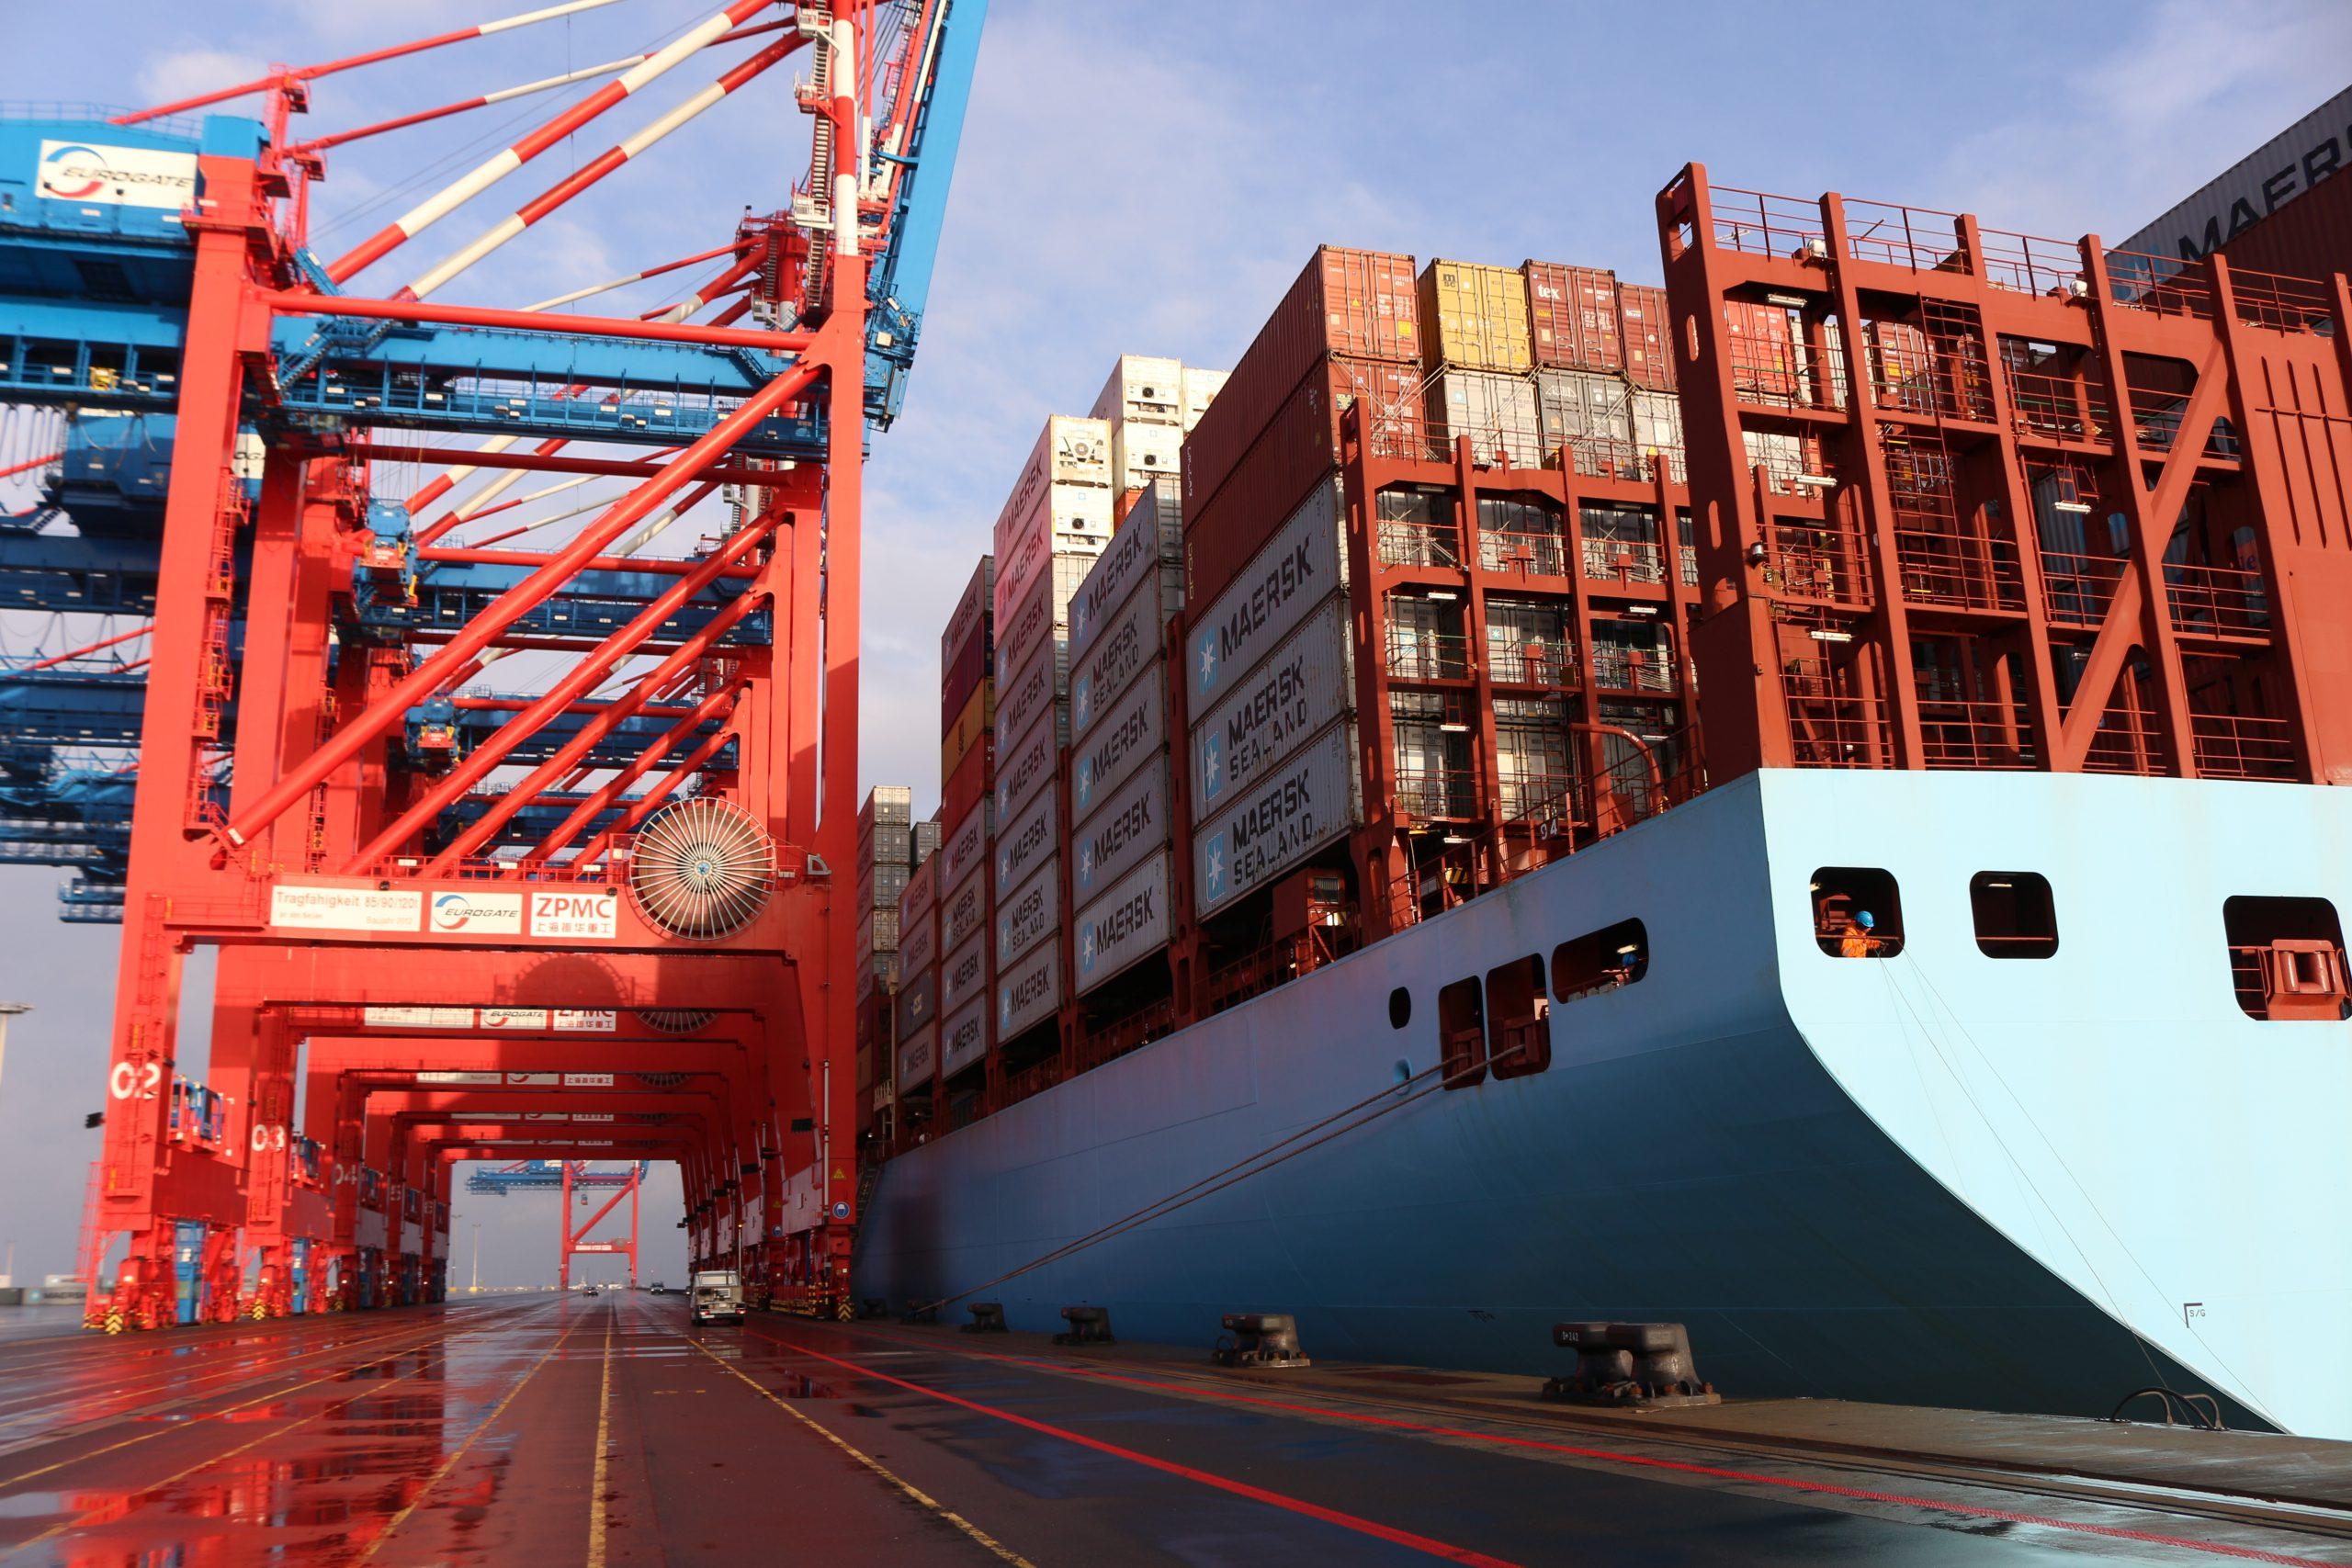 https://seaports.de/content/uploads/Wilhelmshaven_Gut_Container_CTW-scaled.jpg